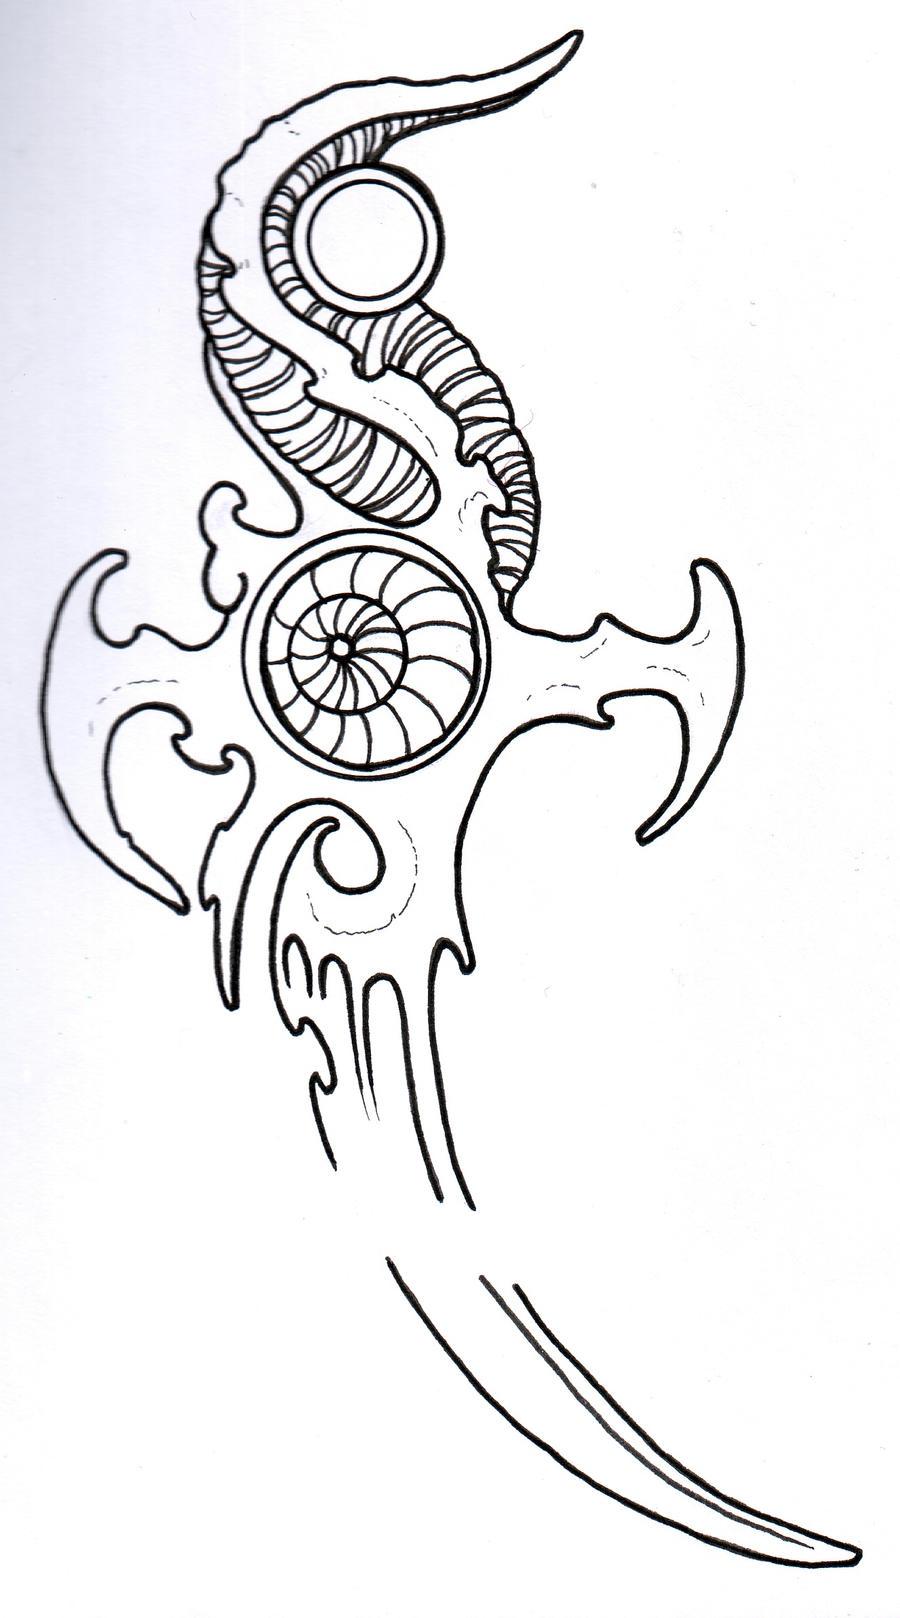 Biomech Dagger Outline by vikingtattoo on DeviantArt Traditional Dagger Tattoo Outline